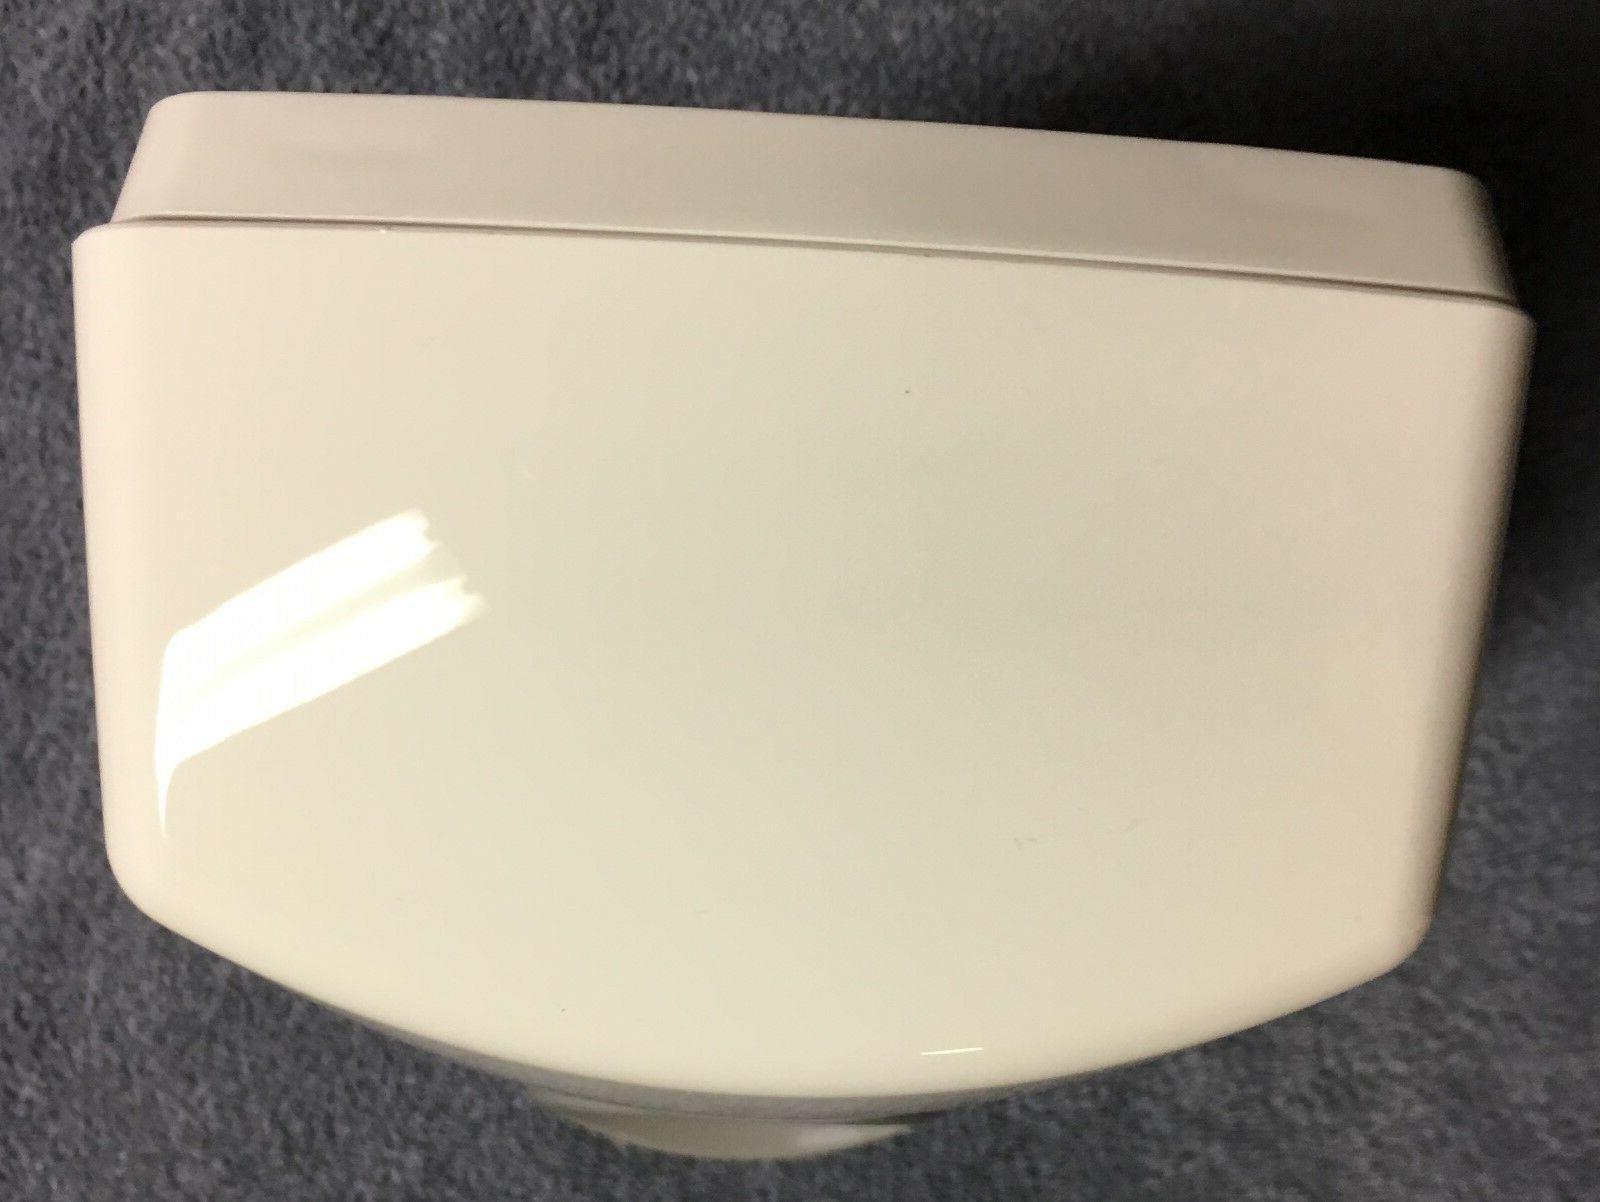 Commercial or Hand Sanitizer Dispenser